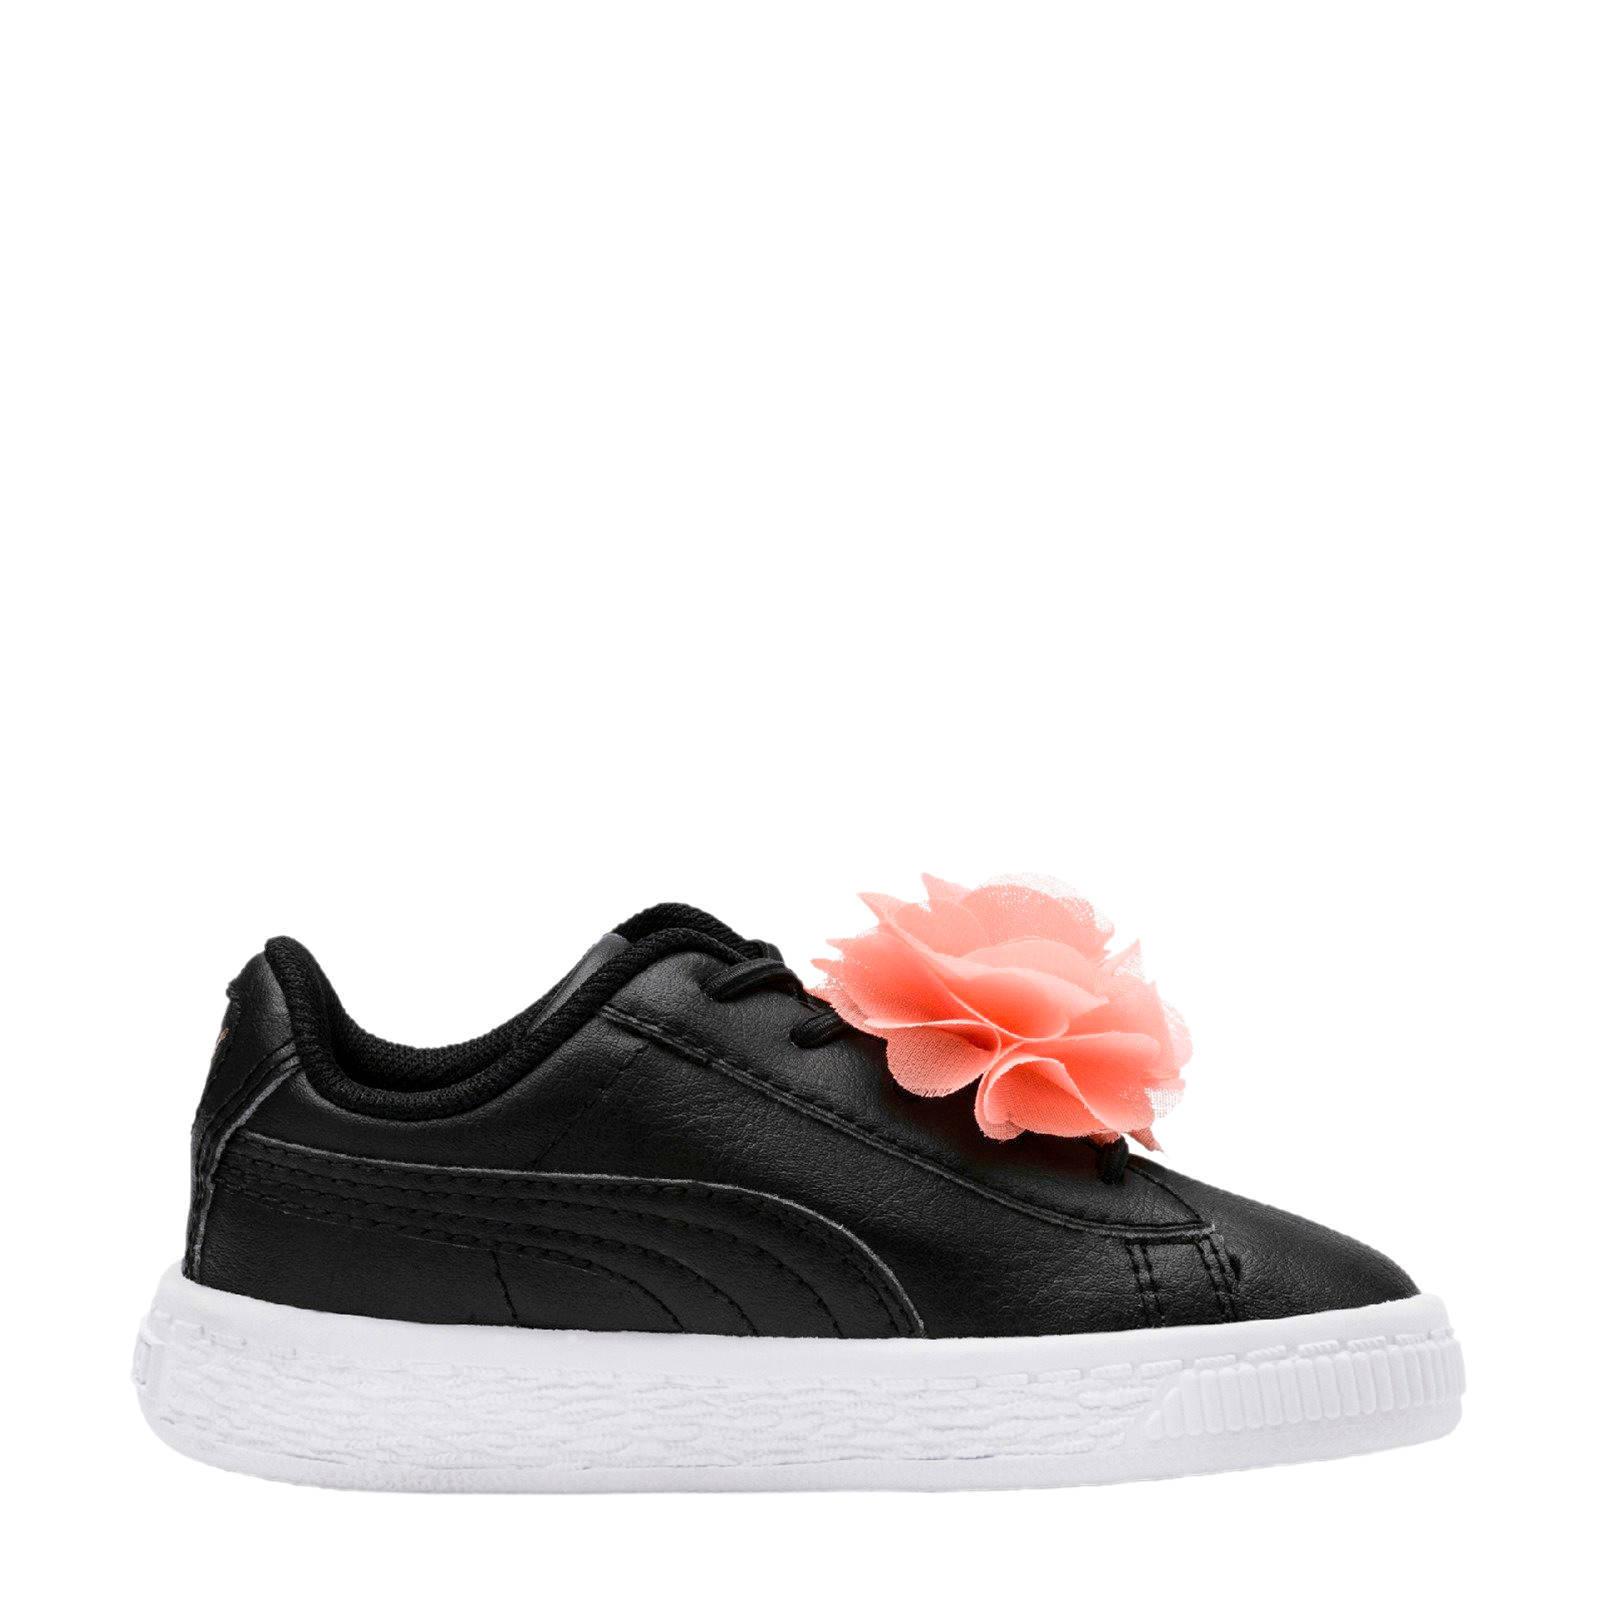 fcfb9b14718 Puma Basket Flower AC Inf sneakers zwart | wehkamp